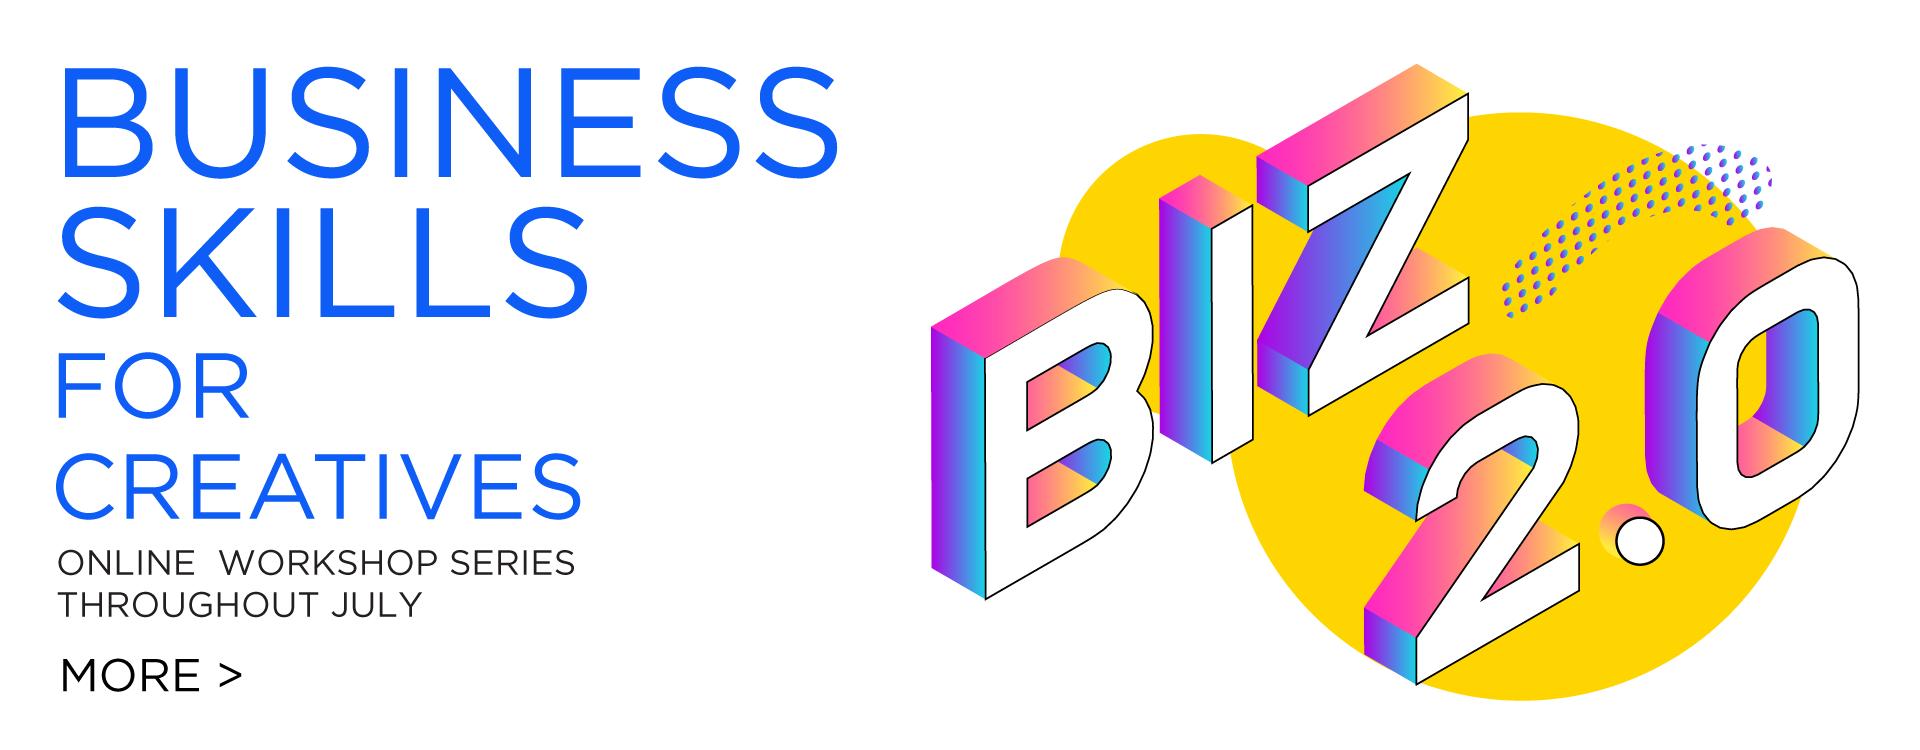 Business Skills 2.0